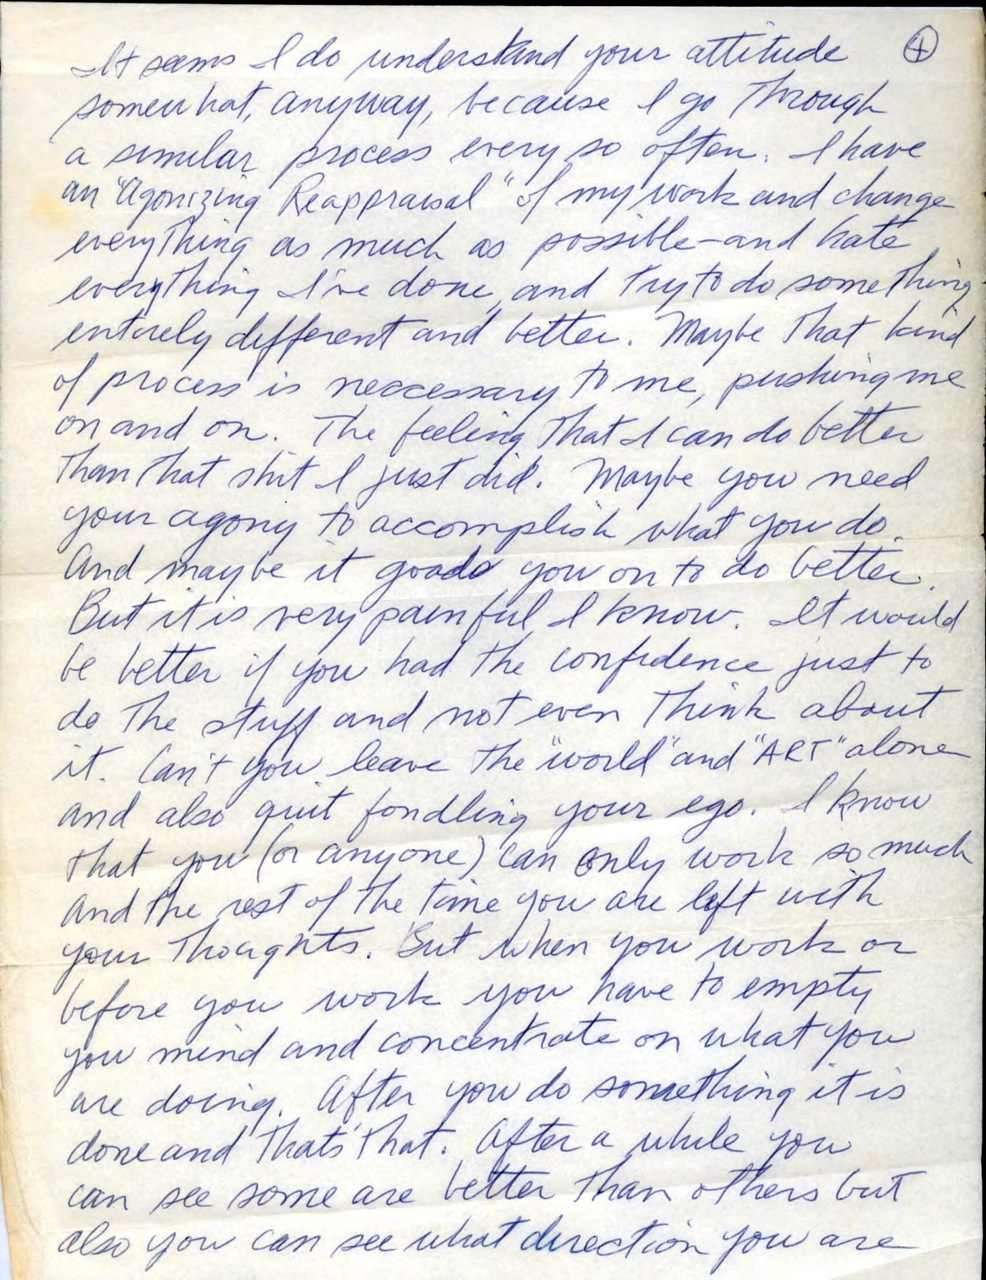 Sol-LeWitt-Eva-Hesse-Letter-Page-4-FINAL.jpg